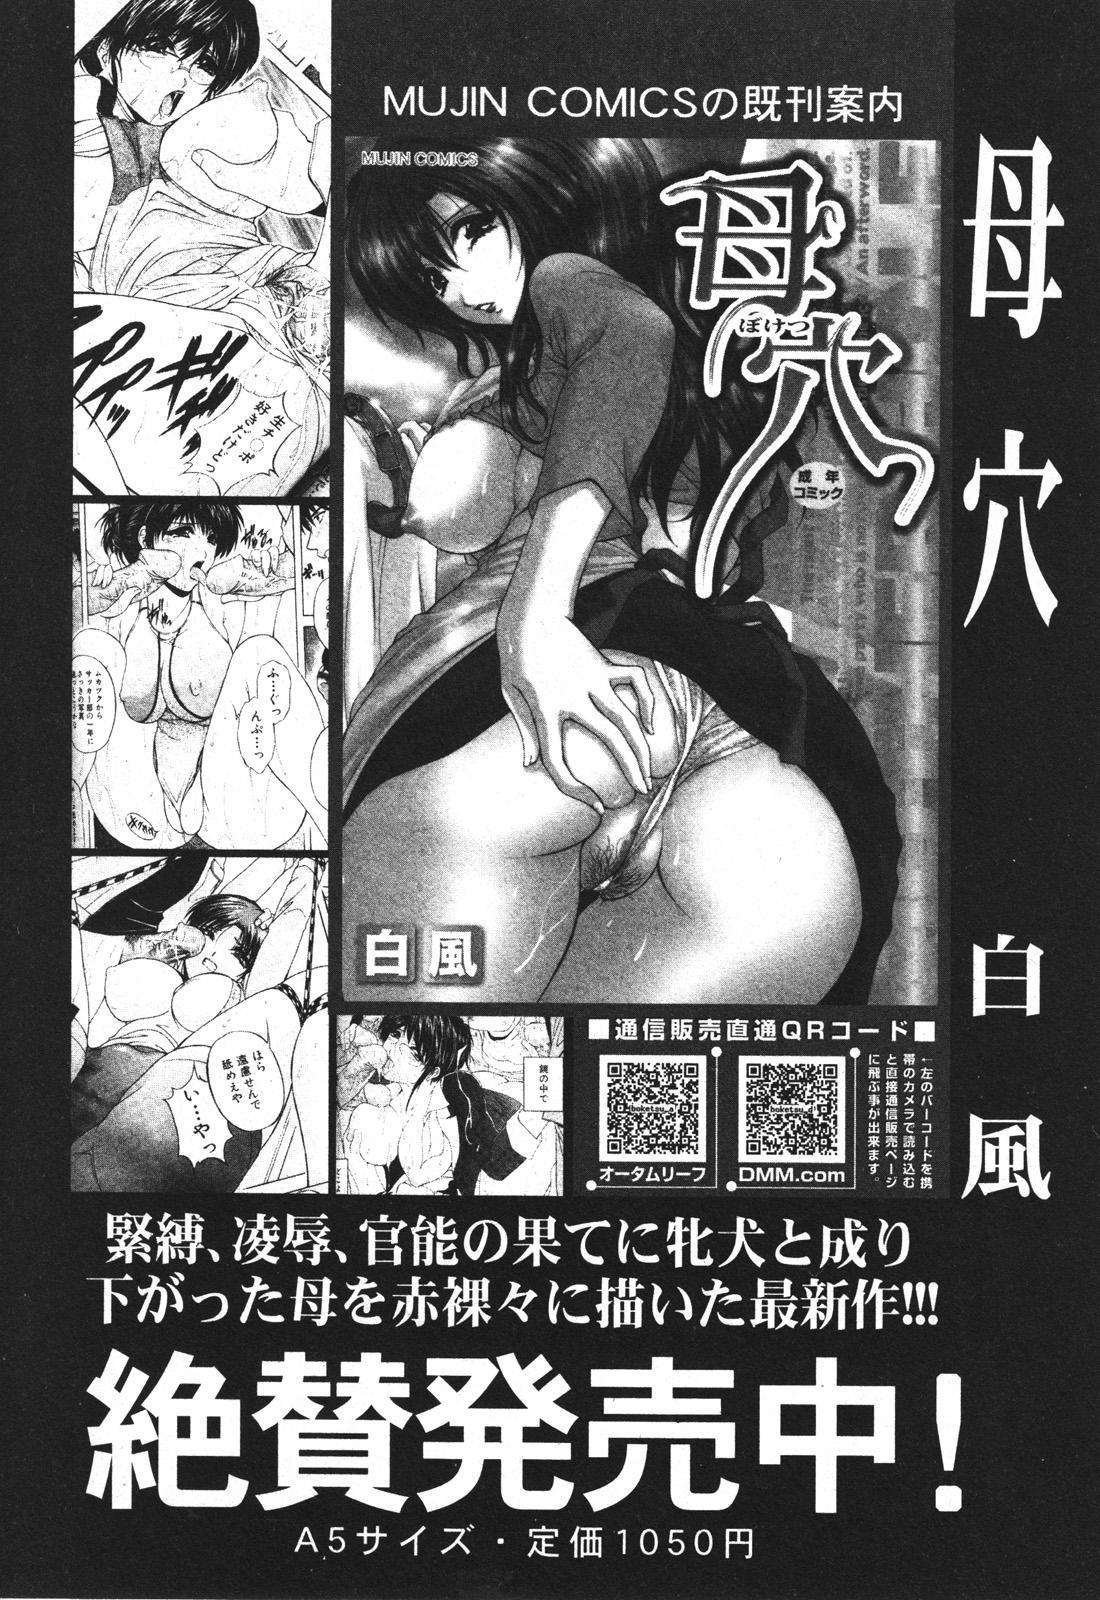 BUSTER COMIC 2010-05 Vol.07 315